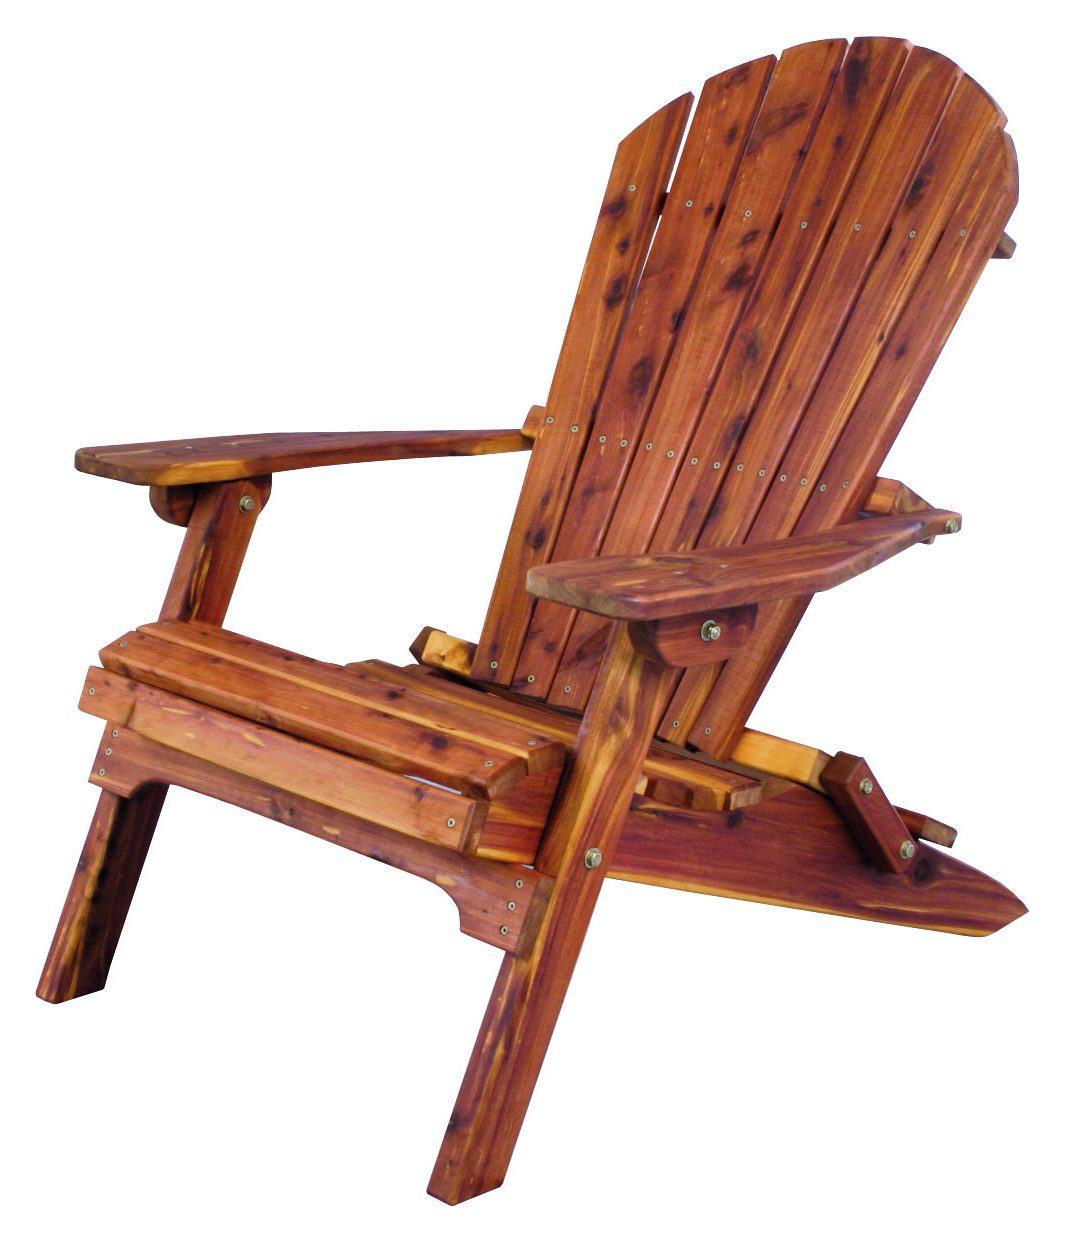 Rustic Red Cedar Adirondack Chairs Sturgeon River